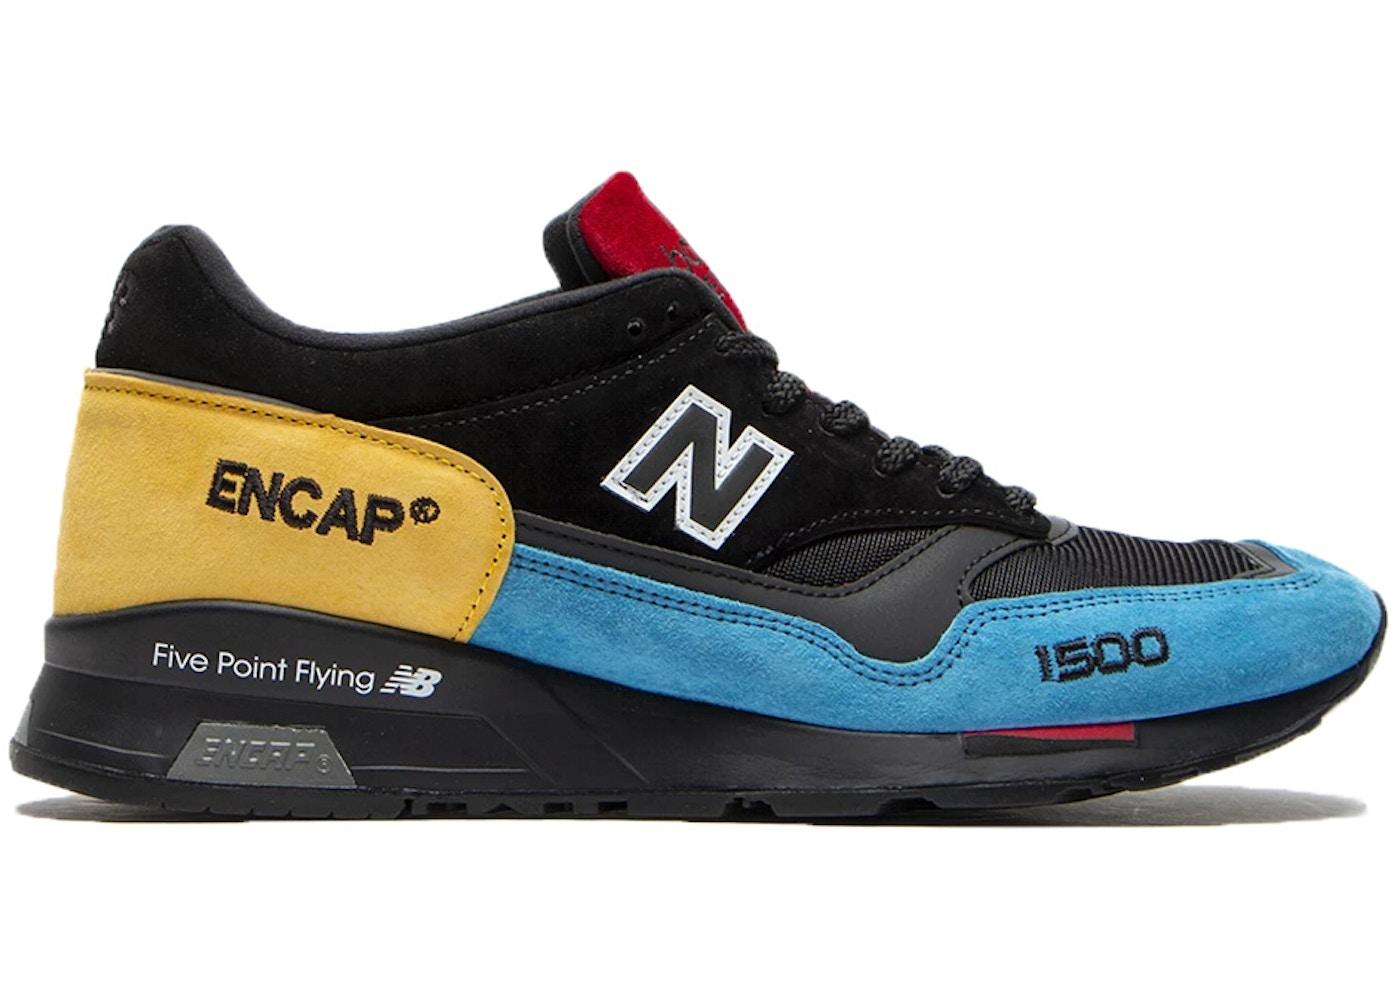 lowest price 66f68 a4875 New Balance 1500 Multi Black